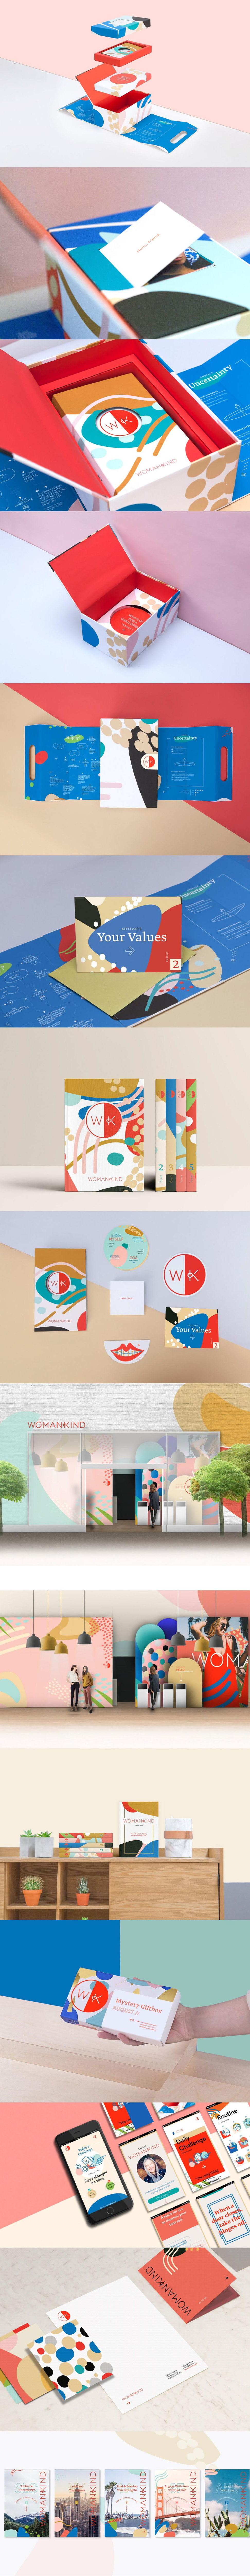 Branding,Graphic Design,Art Direction